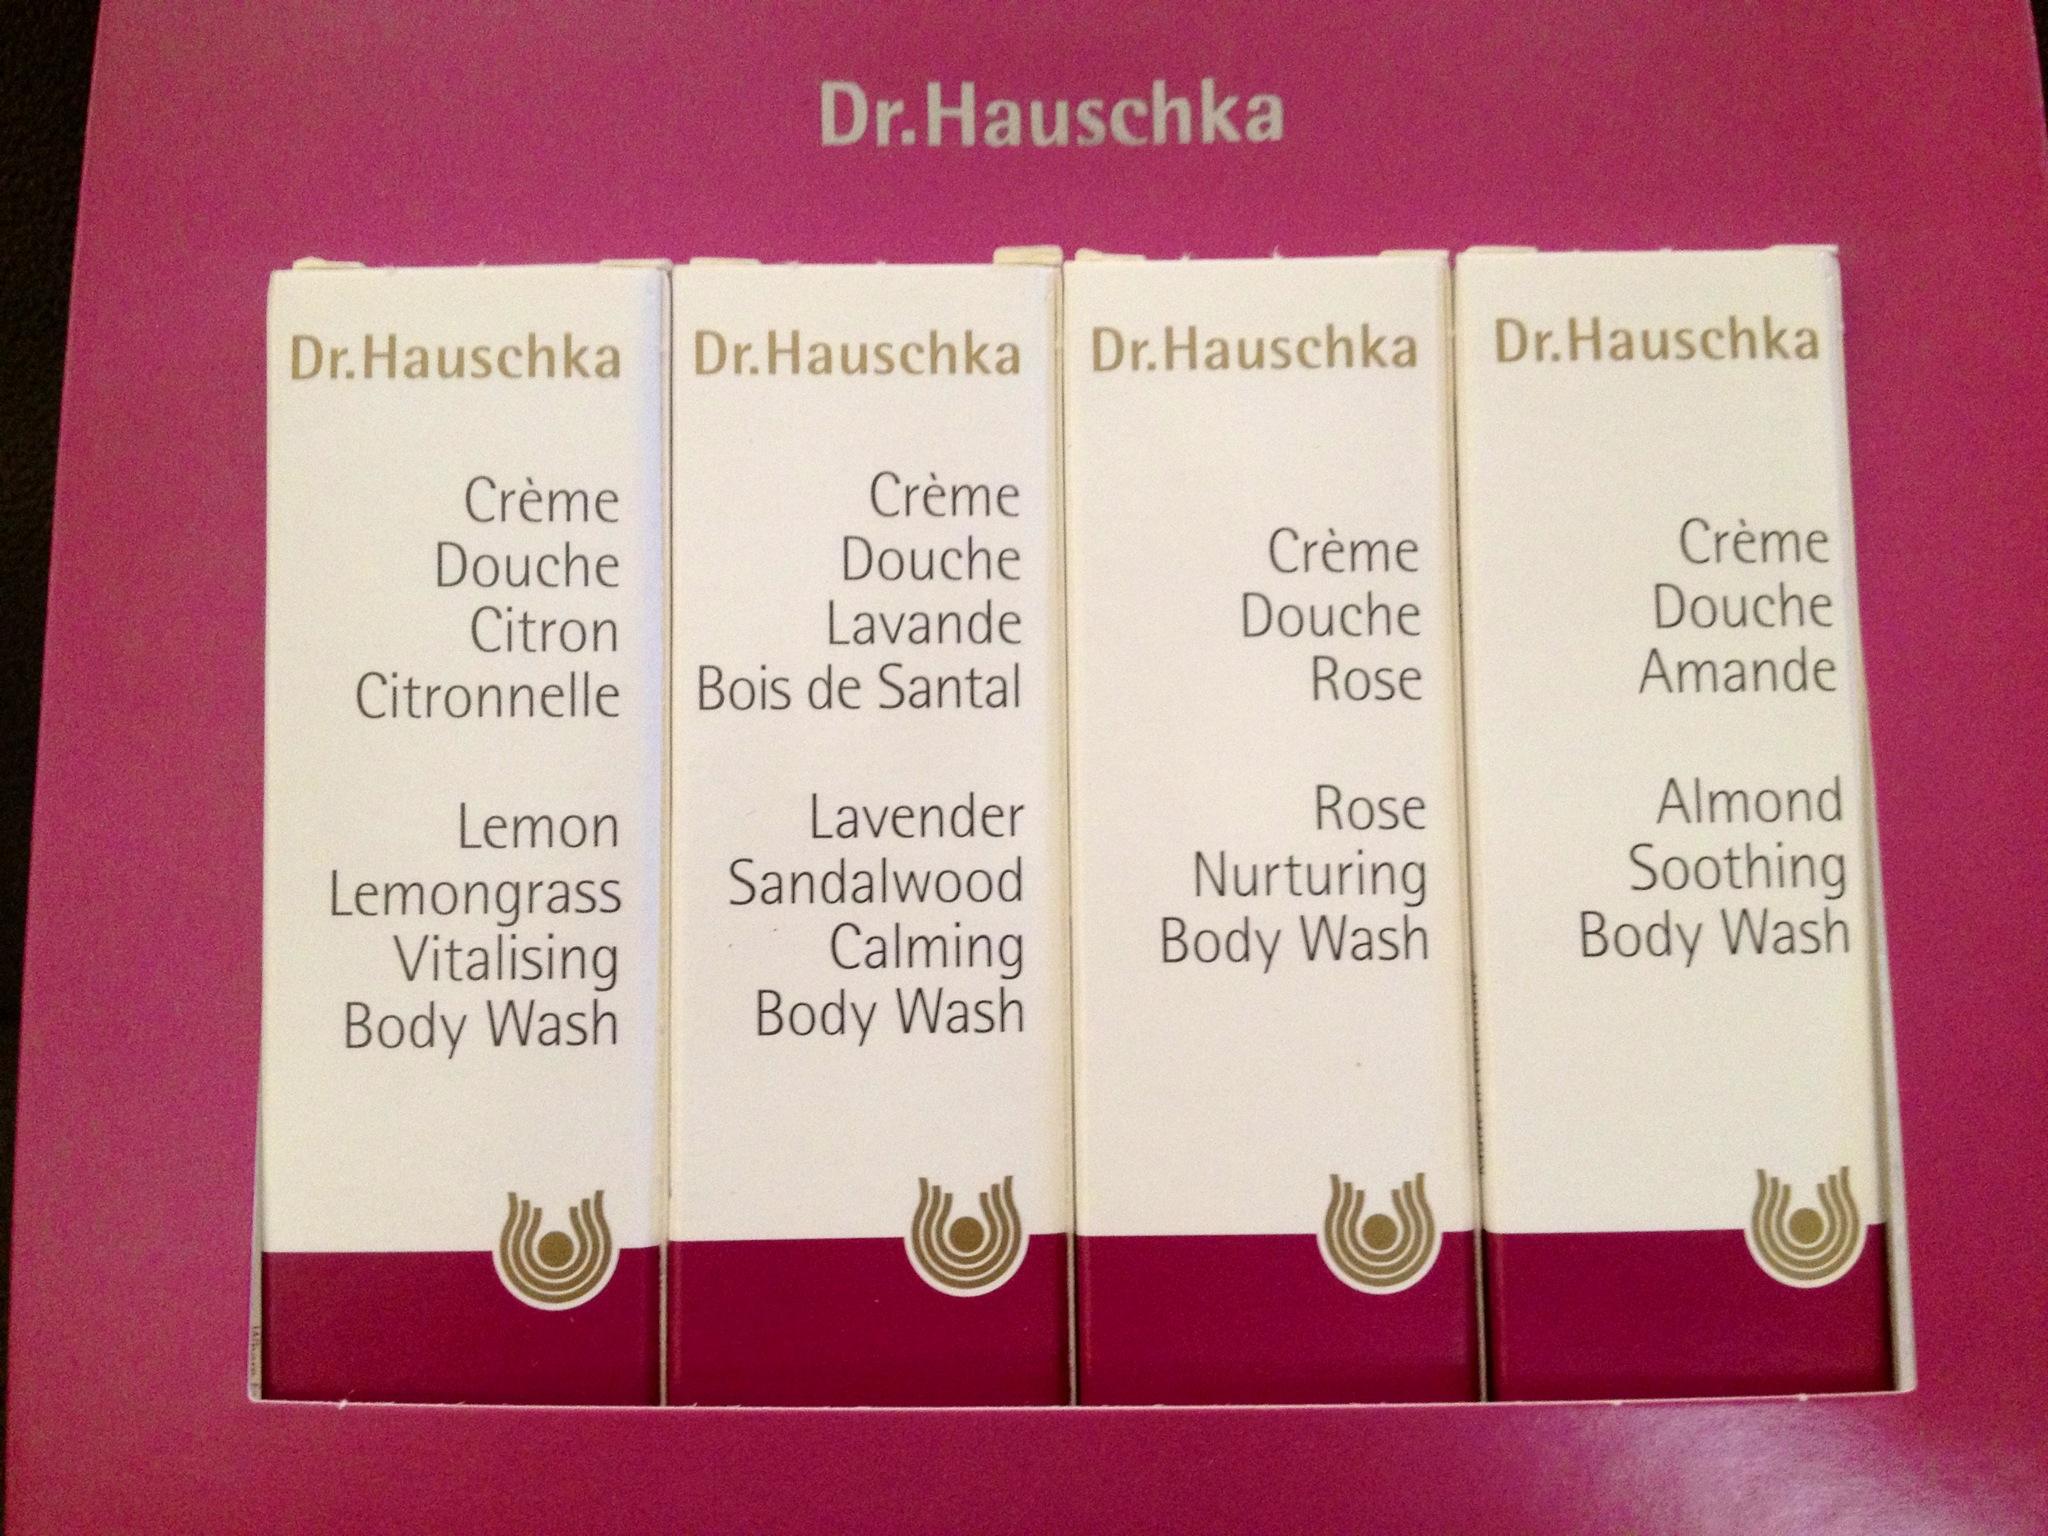 Dr. Hauschka Skin Care Line